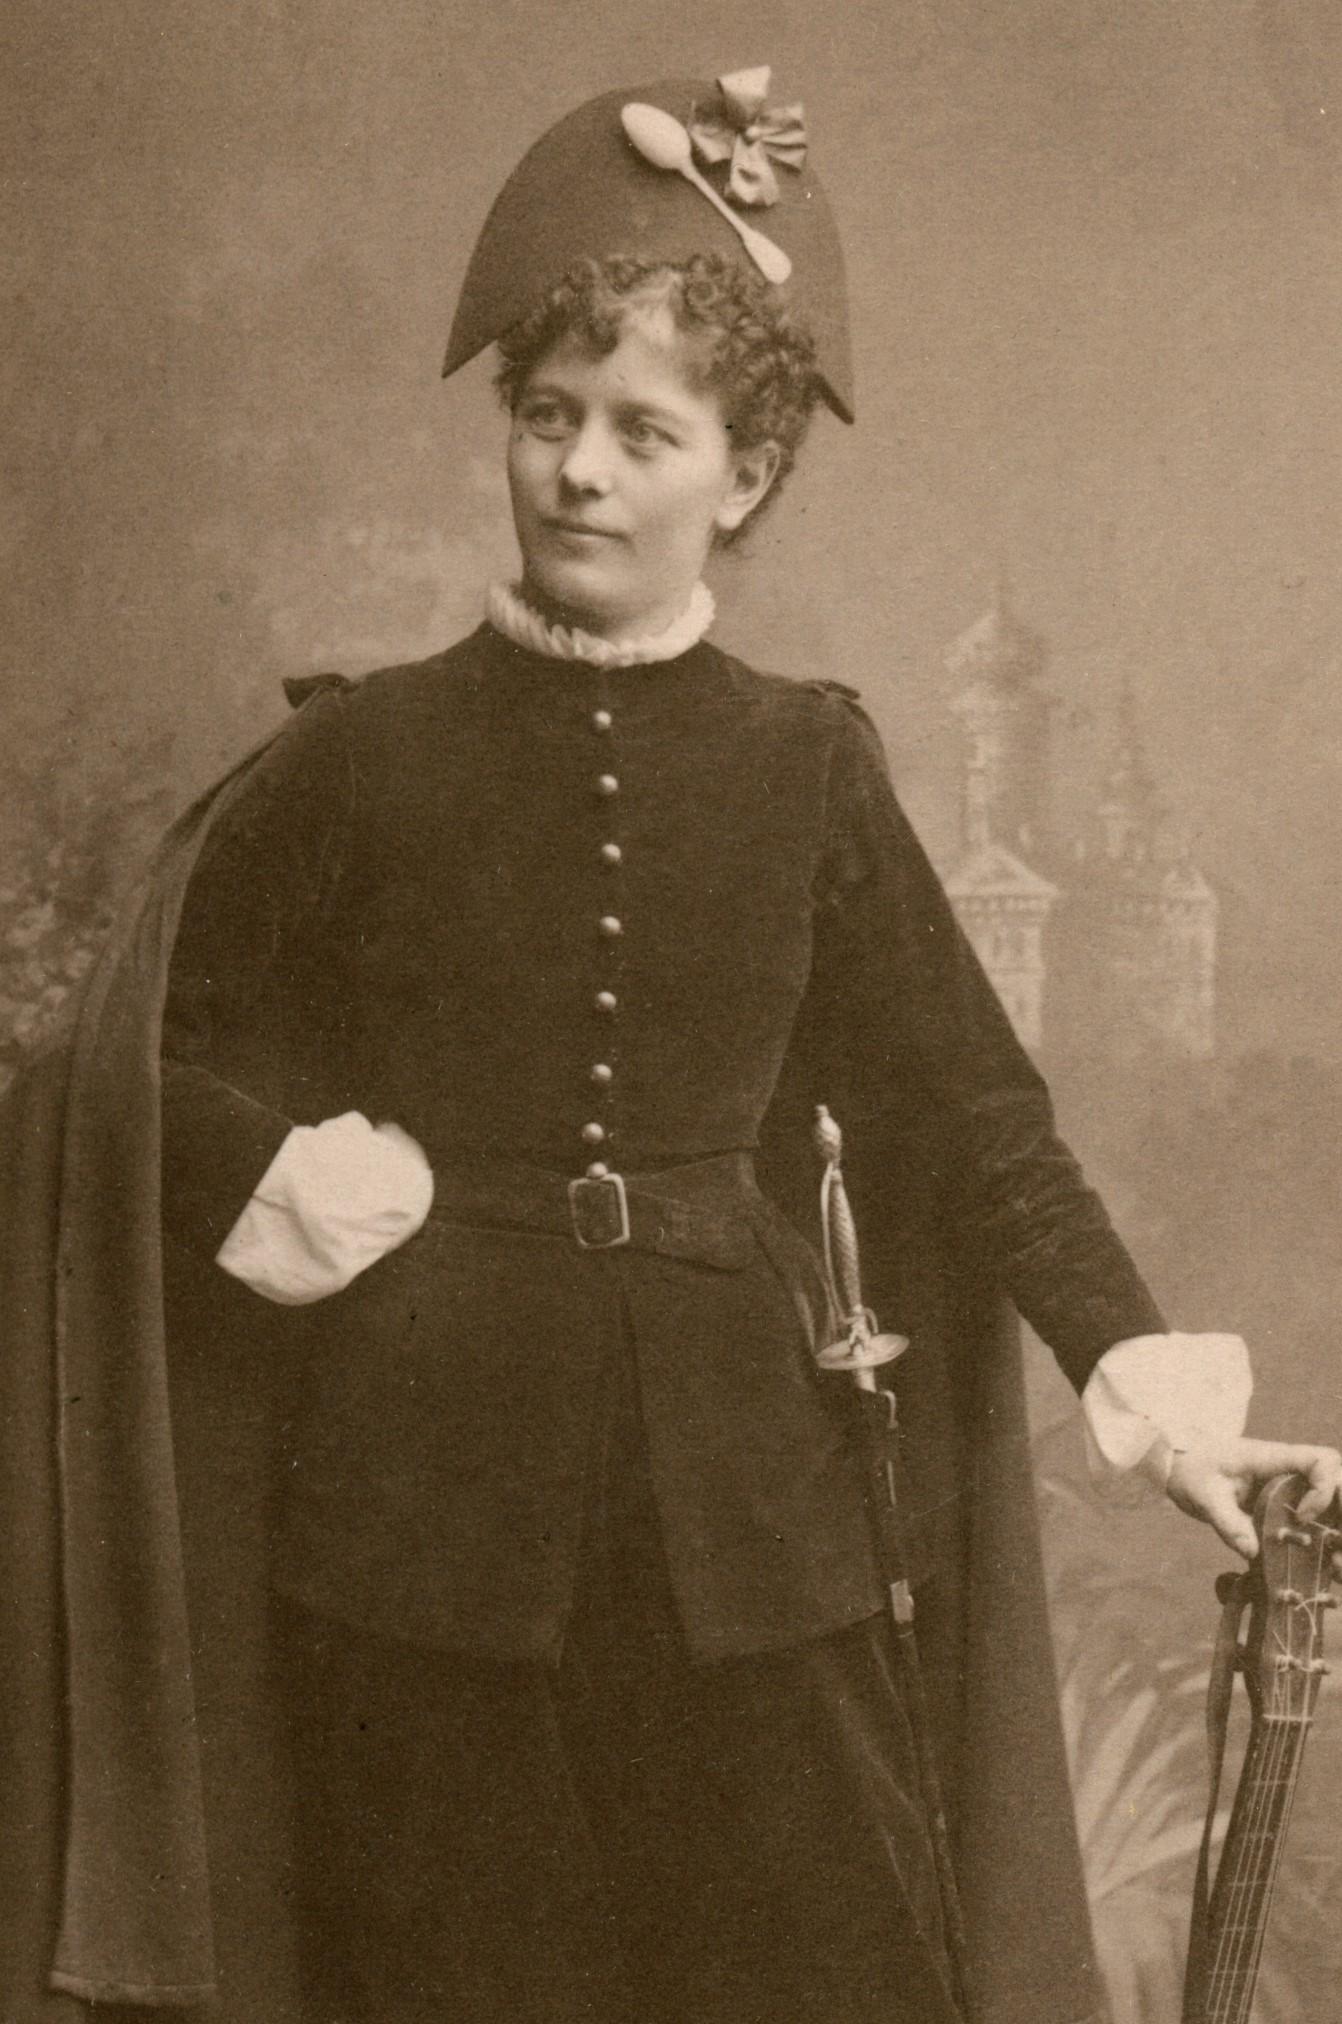 Anna Karlsohn in costume as Benito in the Royal Swedish Opera production of Spanska studenter, 1884. Photo: Gösta Florman (1831-1900). Musik- och teaterbiblioteket, H4_207